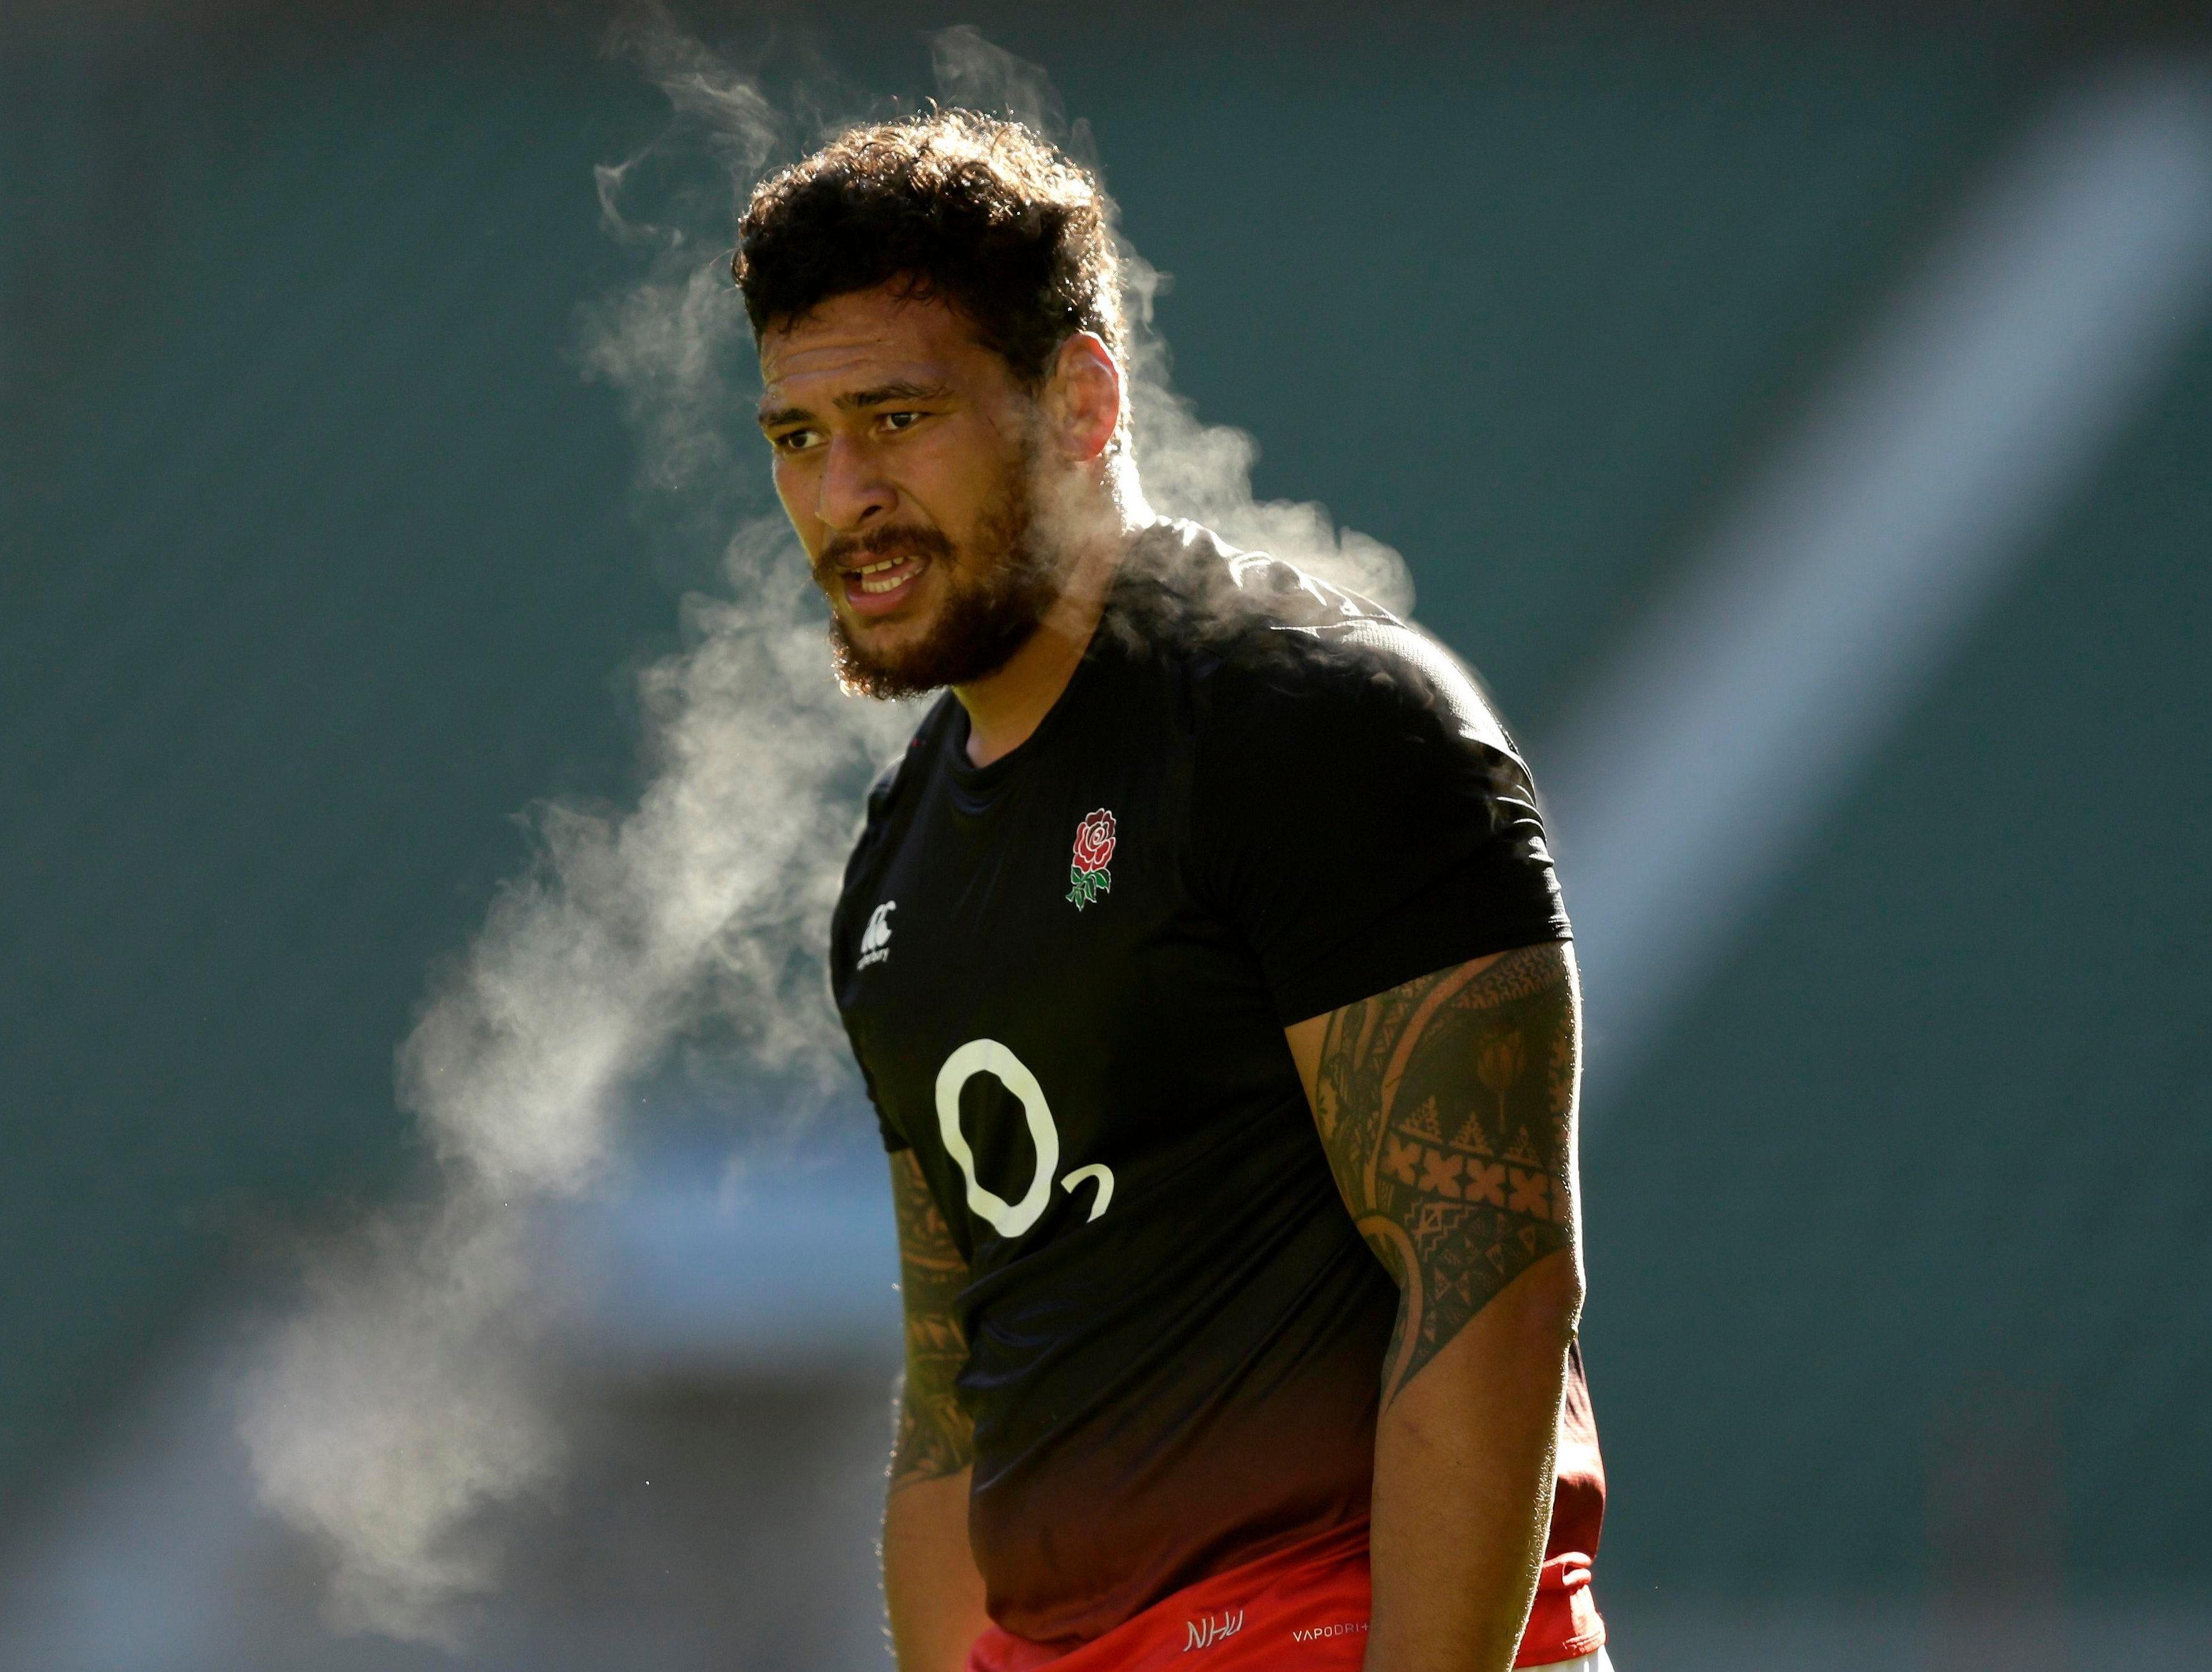 England star Nathan Hughes has copped a six-week ban